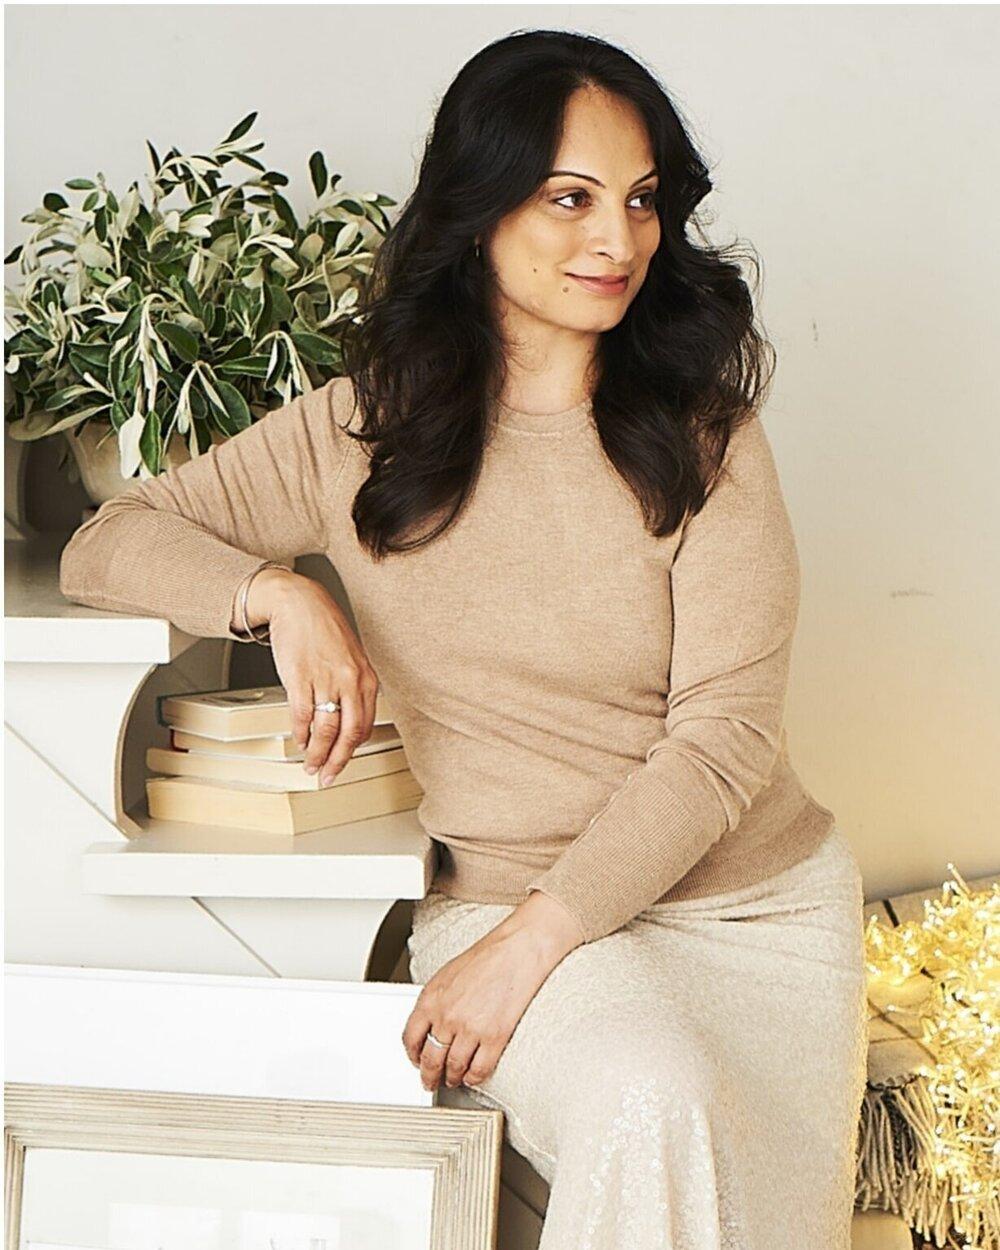 Kiran Singh, Blogger and interior designer